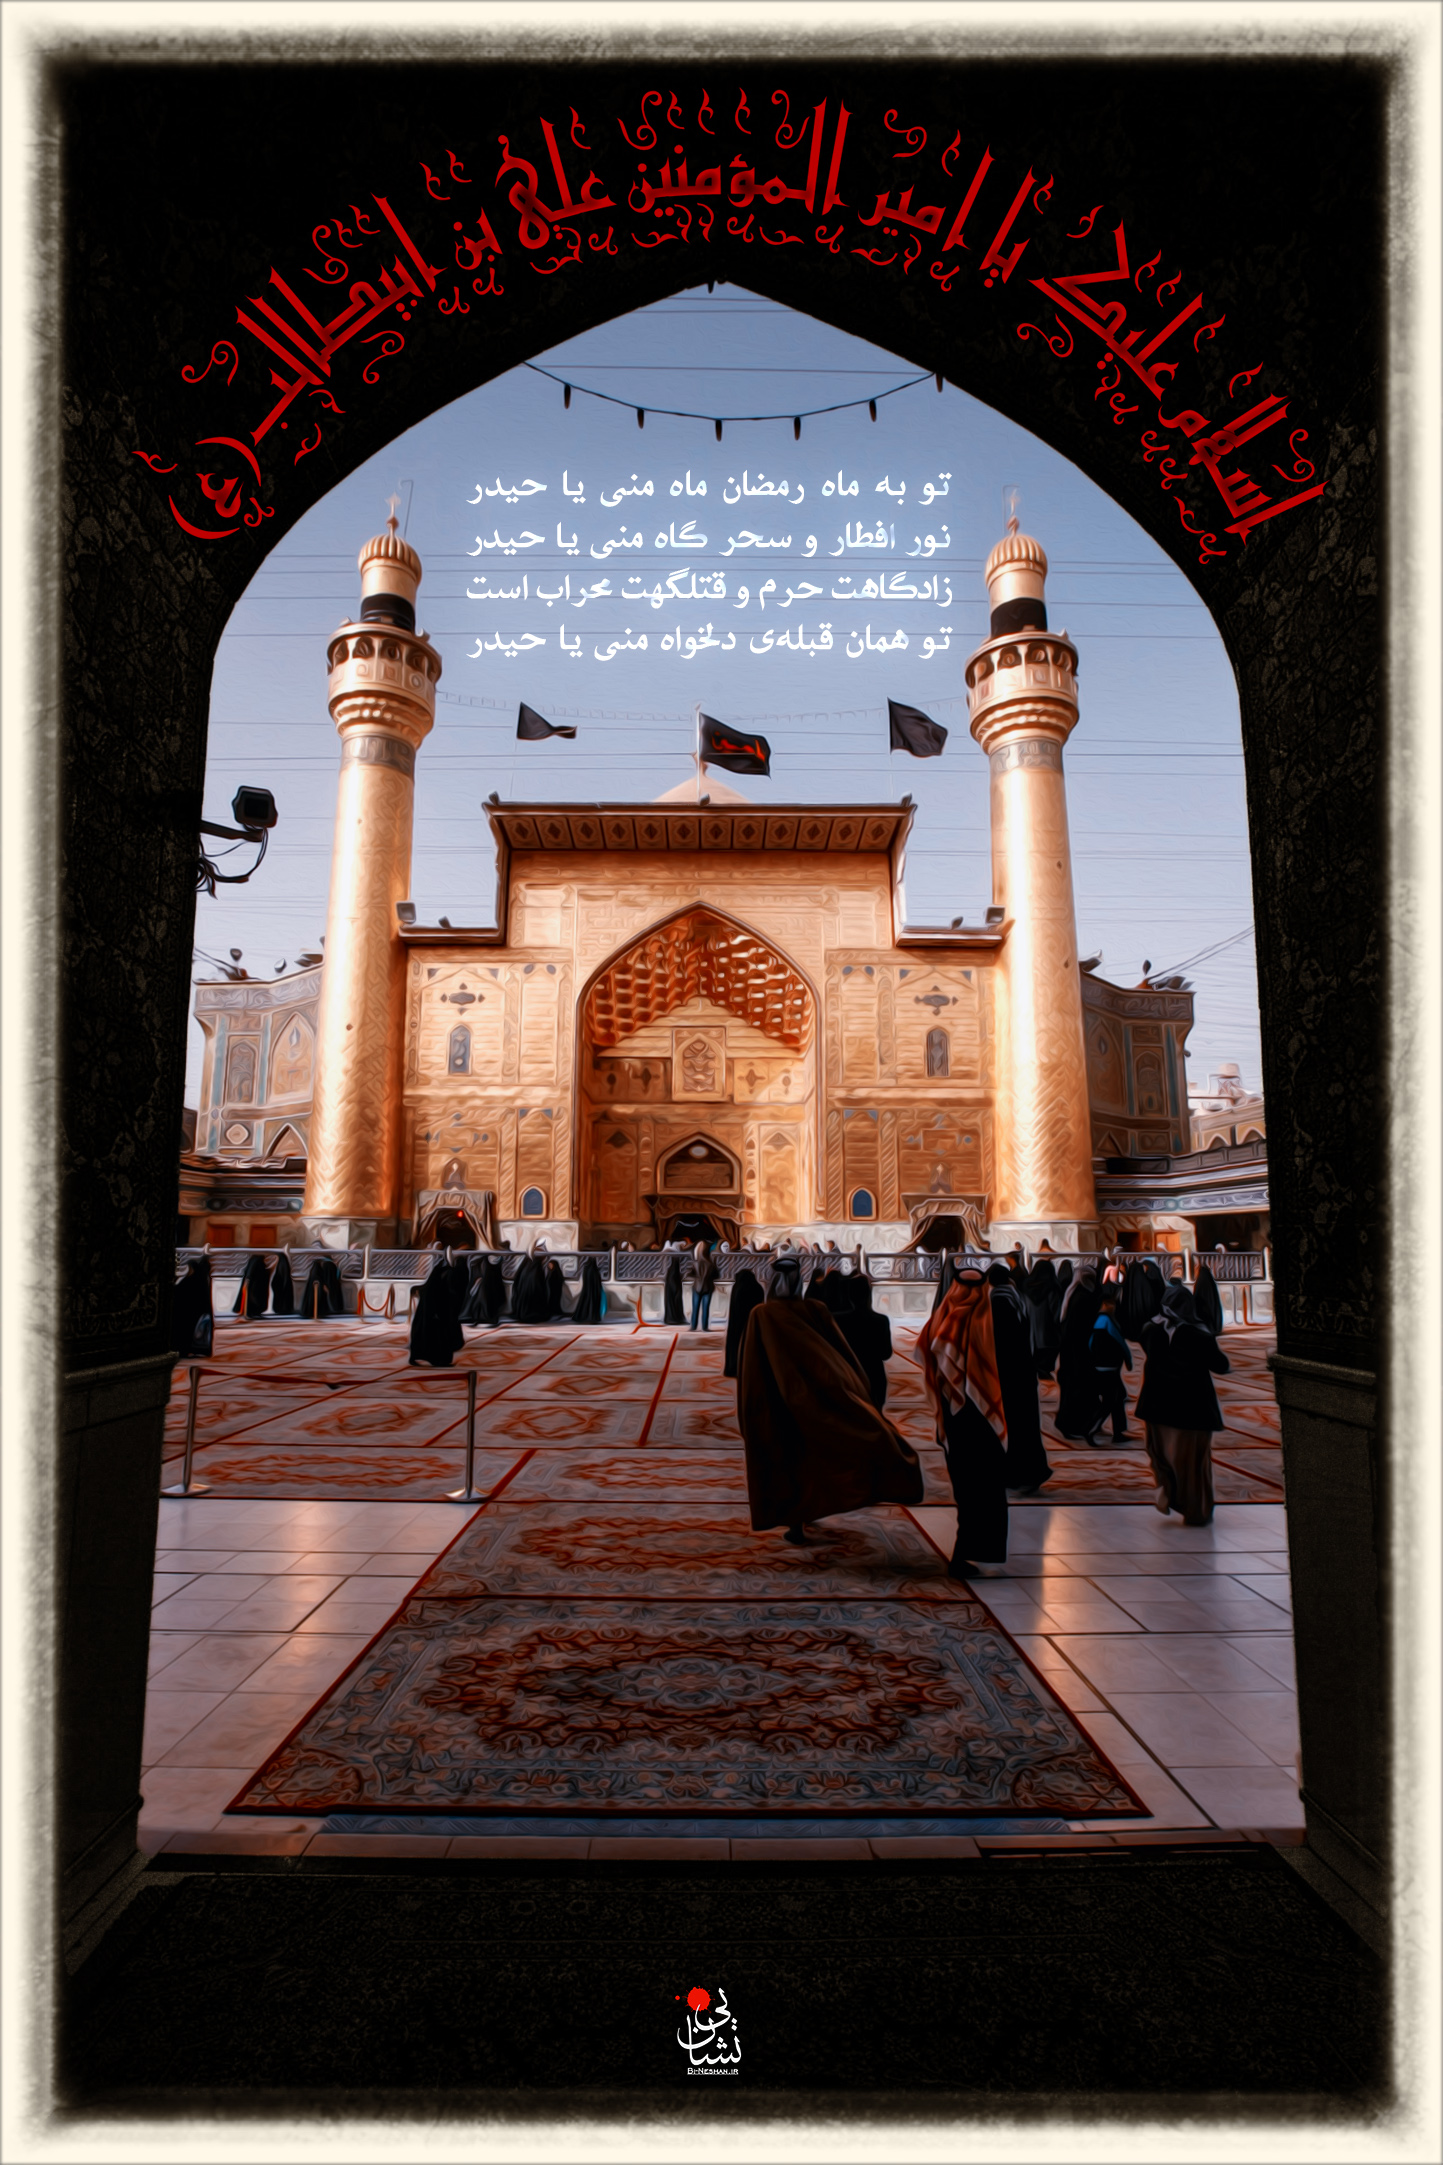 http://bi-neshan.ir/wp-content/uploads/2014/07/E.Alia-24.jpg